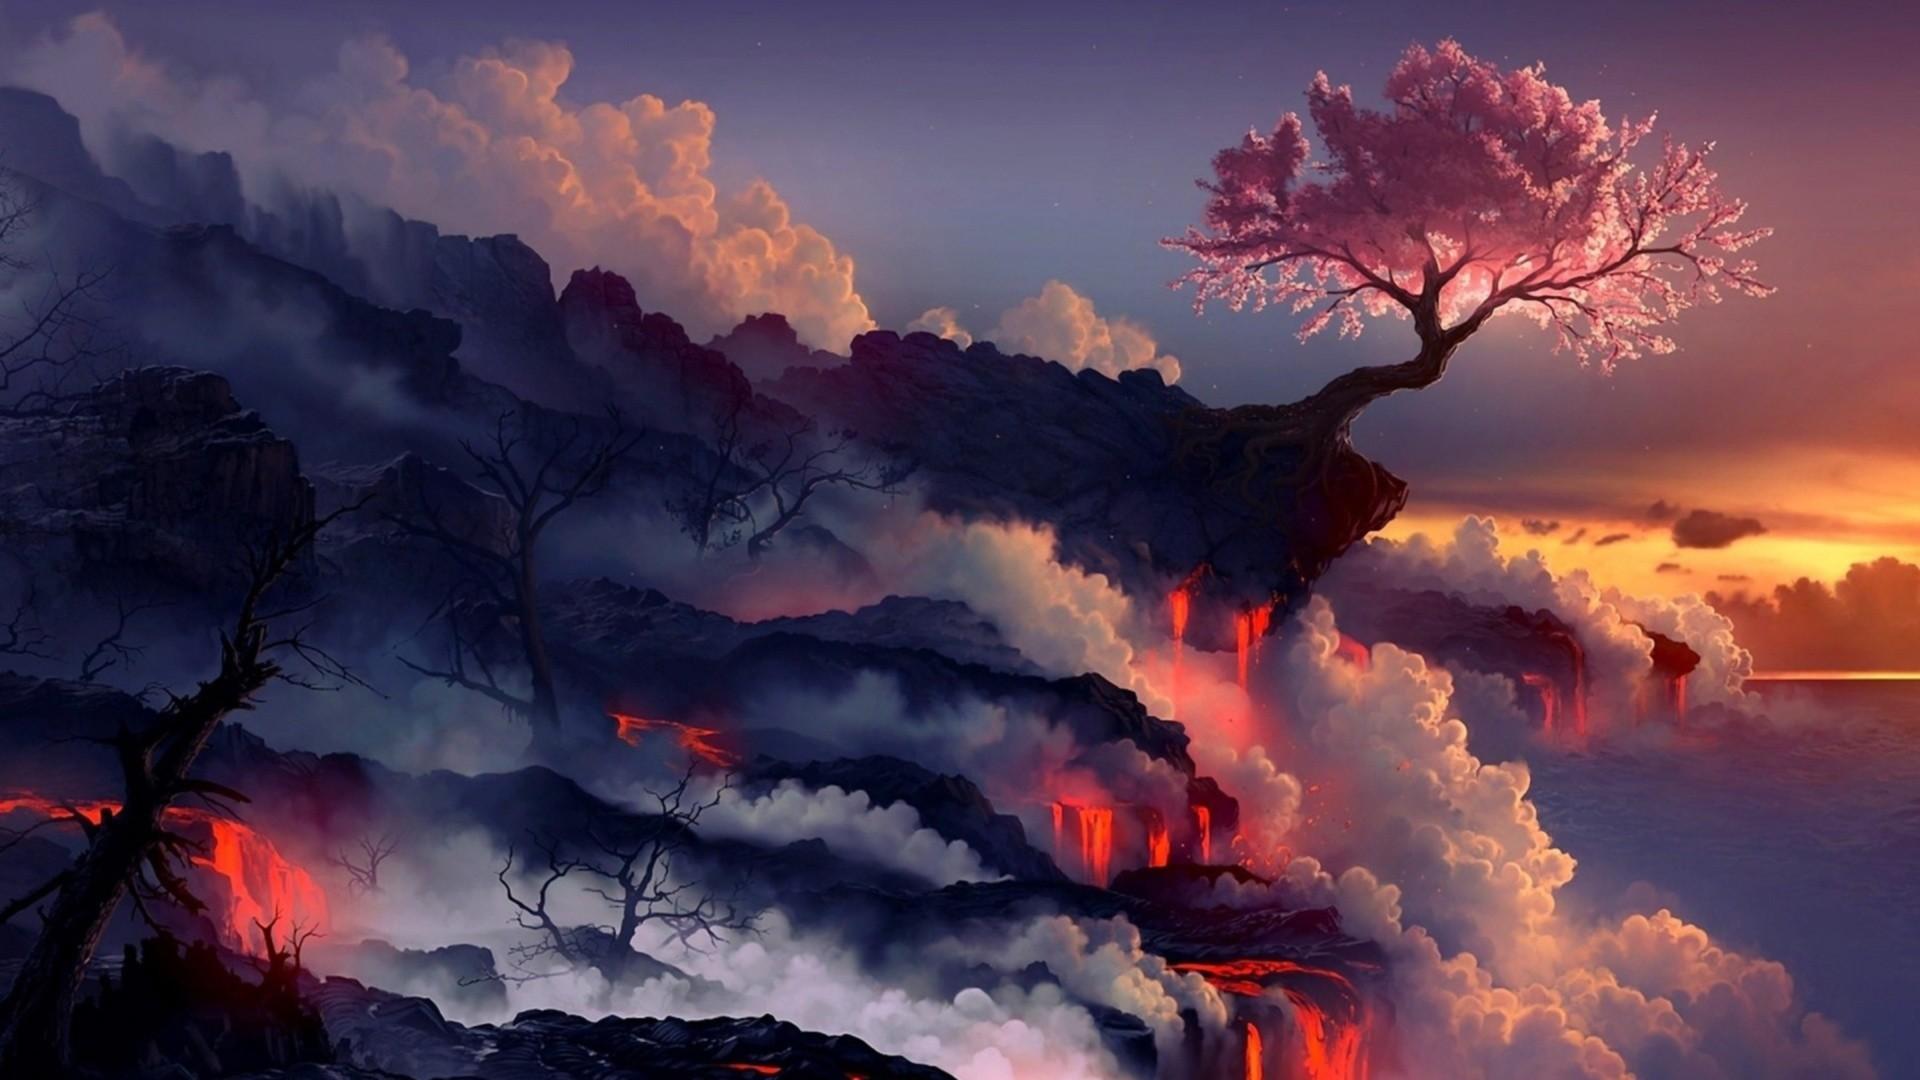 High Resolution Amazing Fantasy Landscape Wallpaper HD 27 Full …    Download Wallpaper   Pinterest   Fantasy landscape, Art google and Fantasy  art …